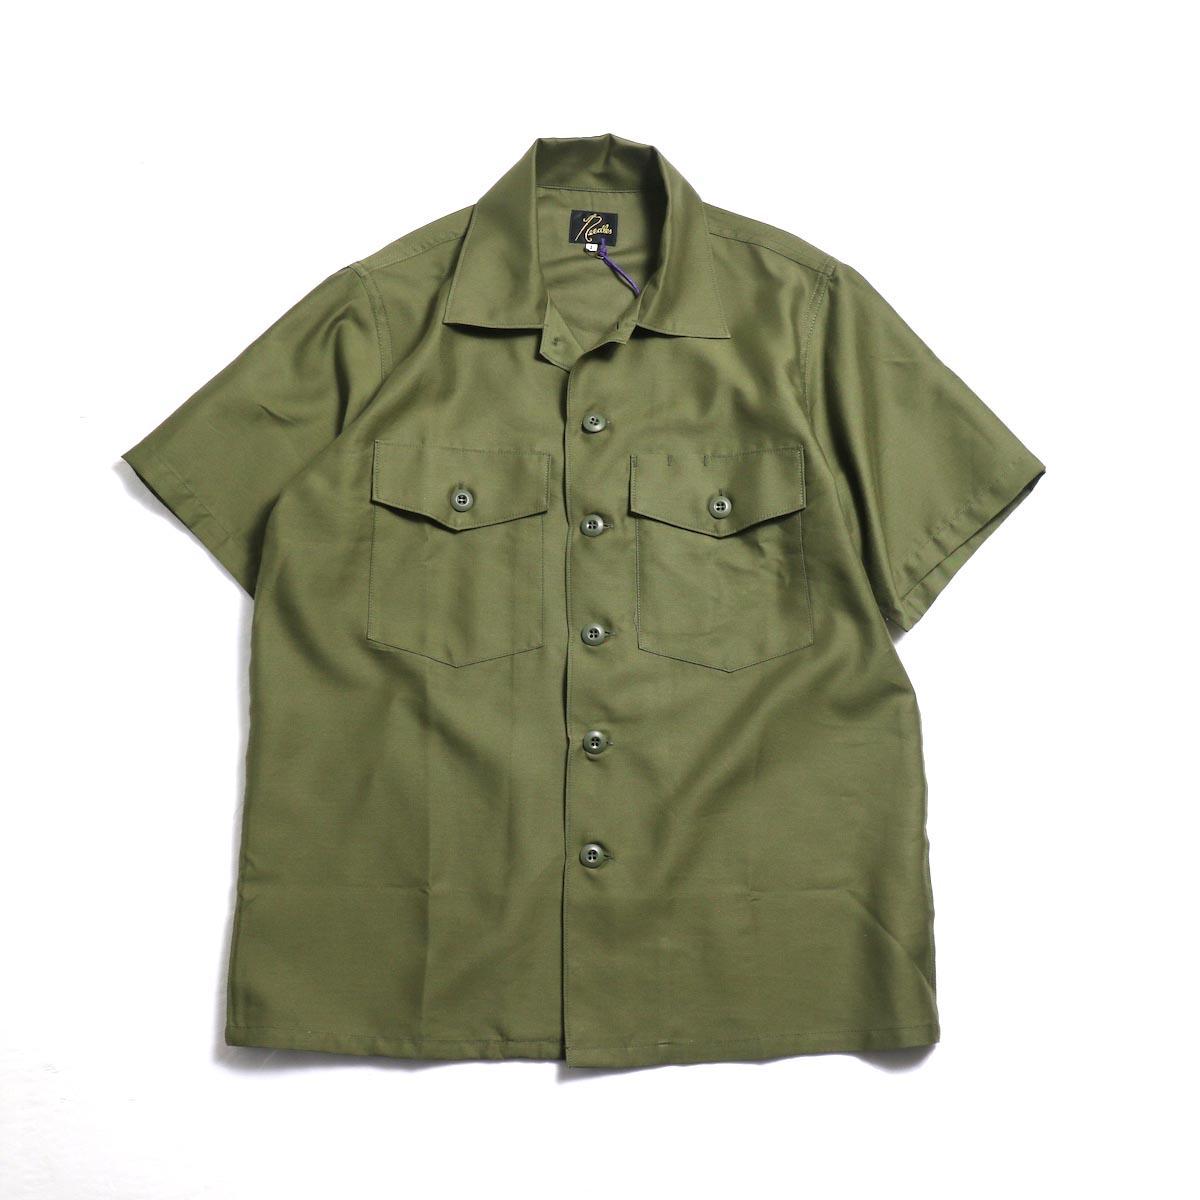 Needles Women / S/S Army Shirt -T/C Back Sateen